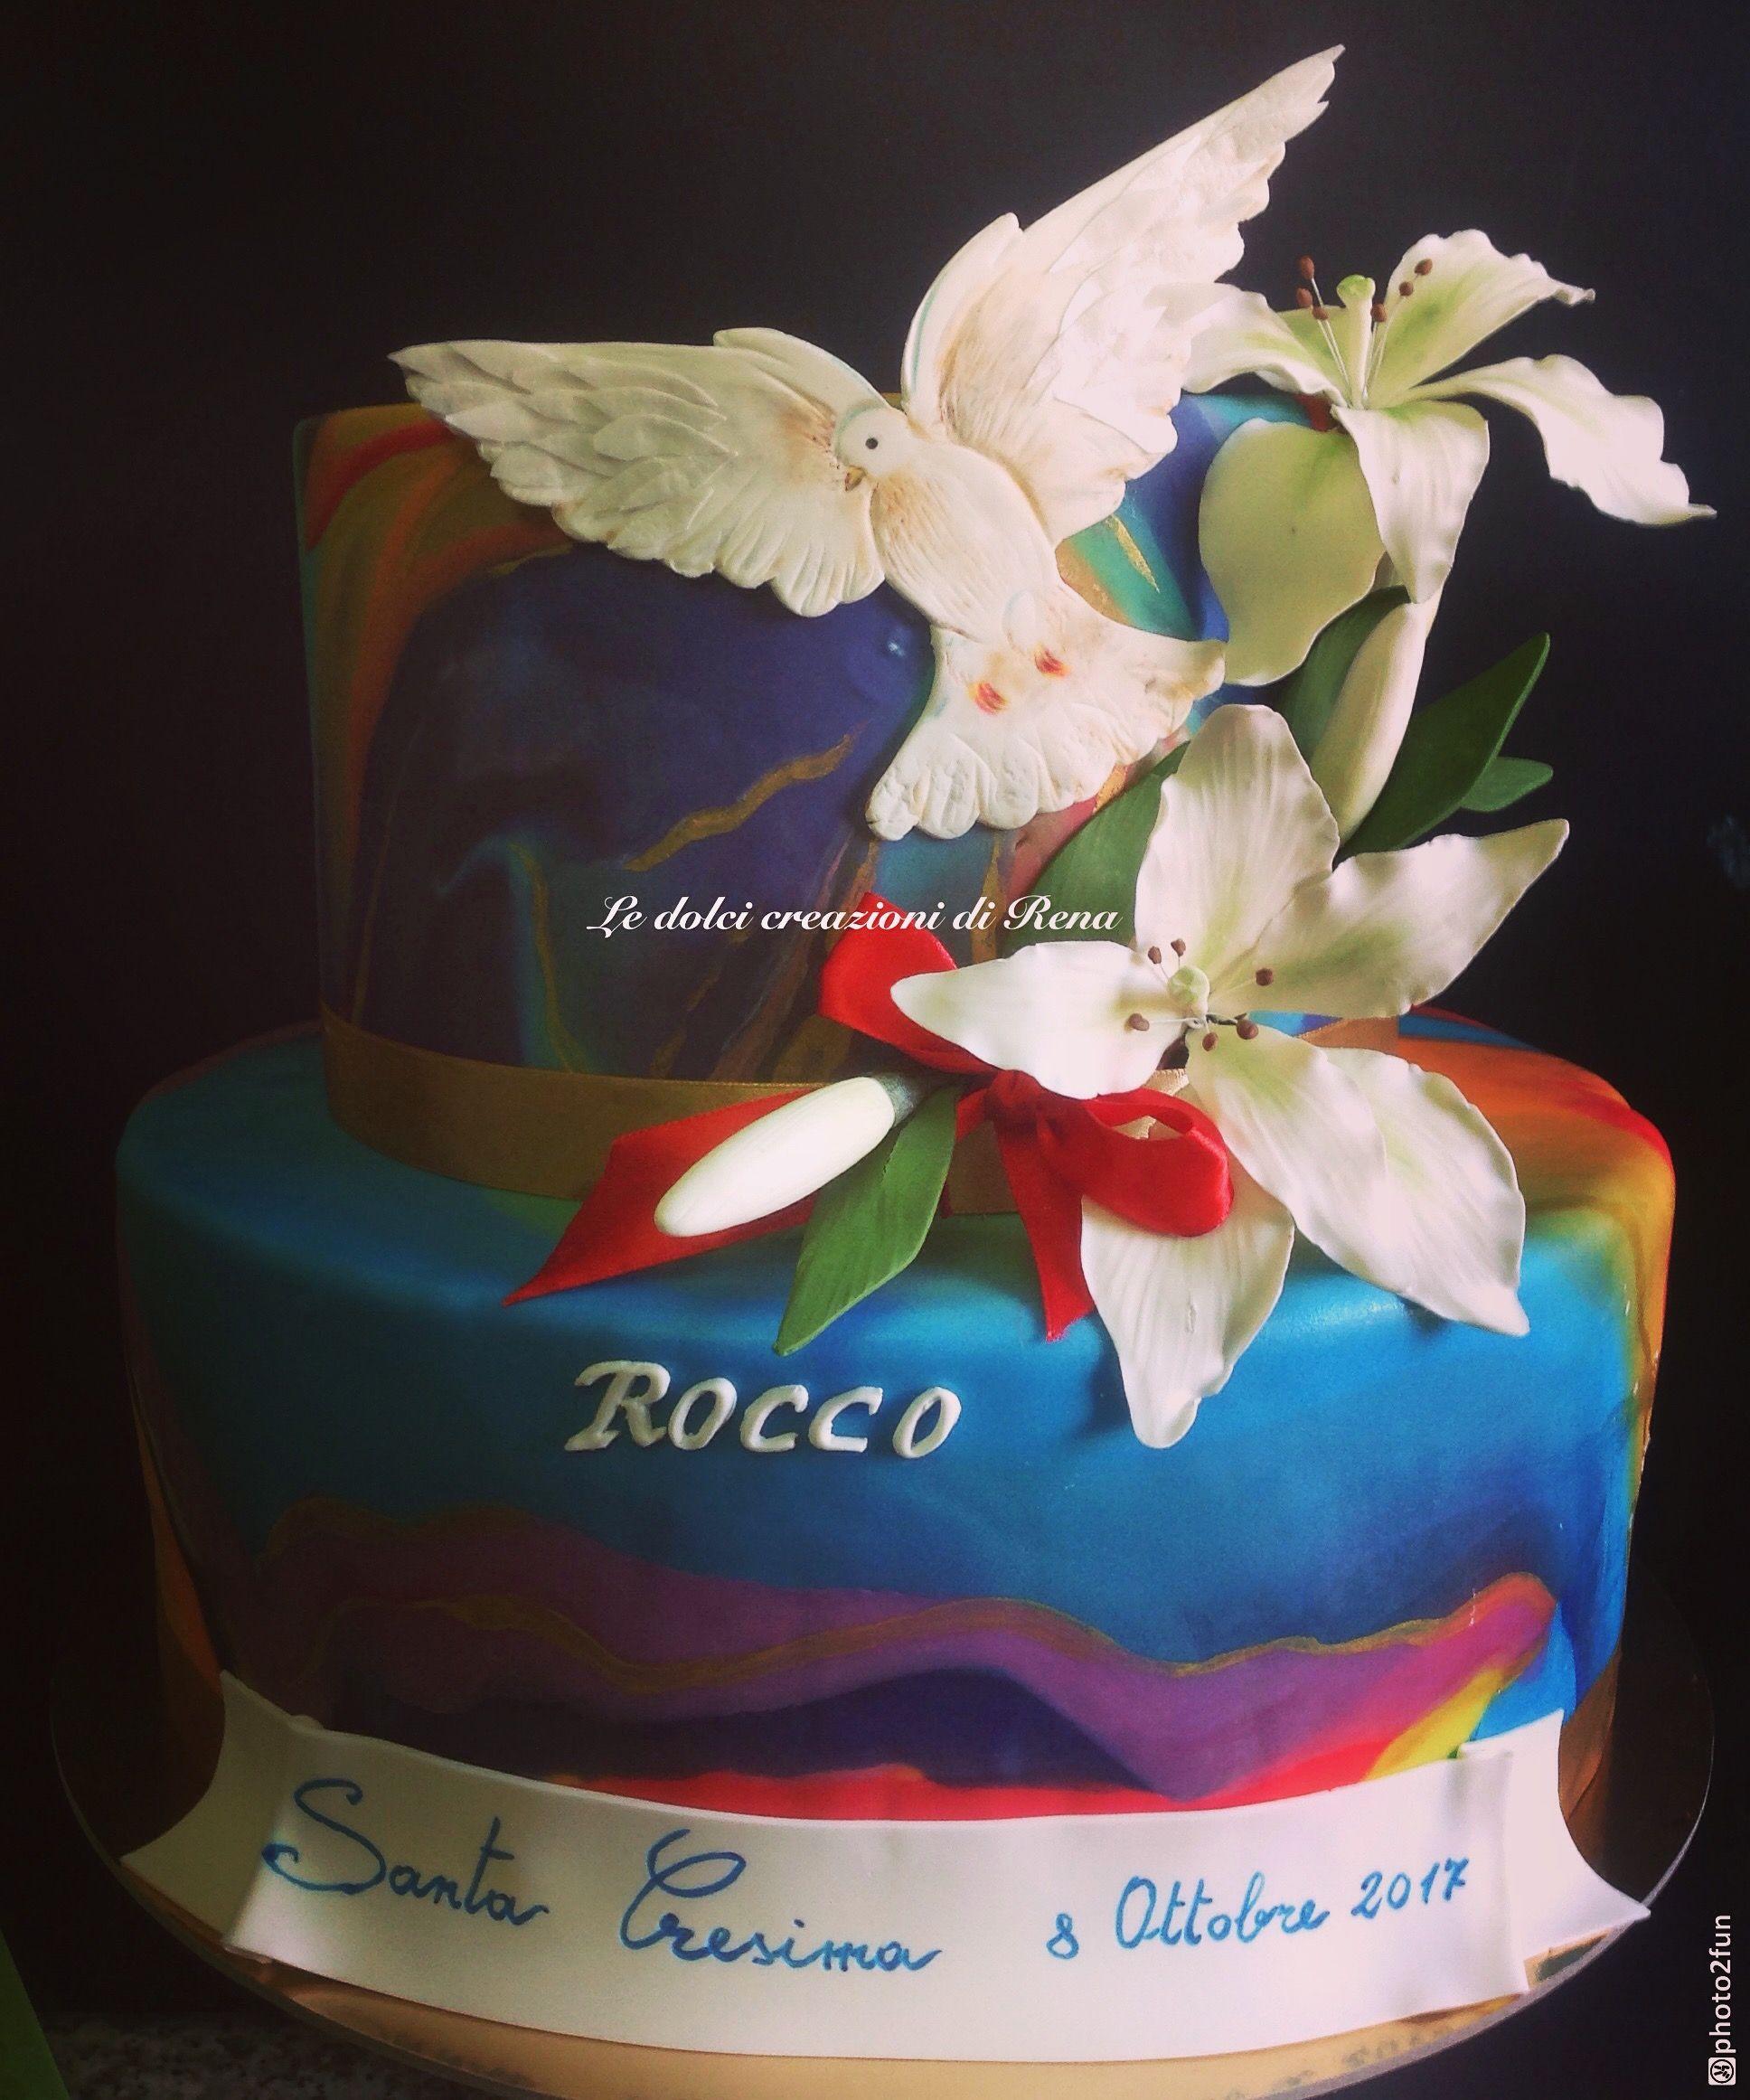 Torta Cresima originale, originale cake, Confirmation, Confirmation ...